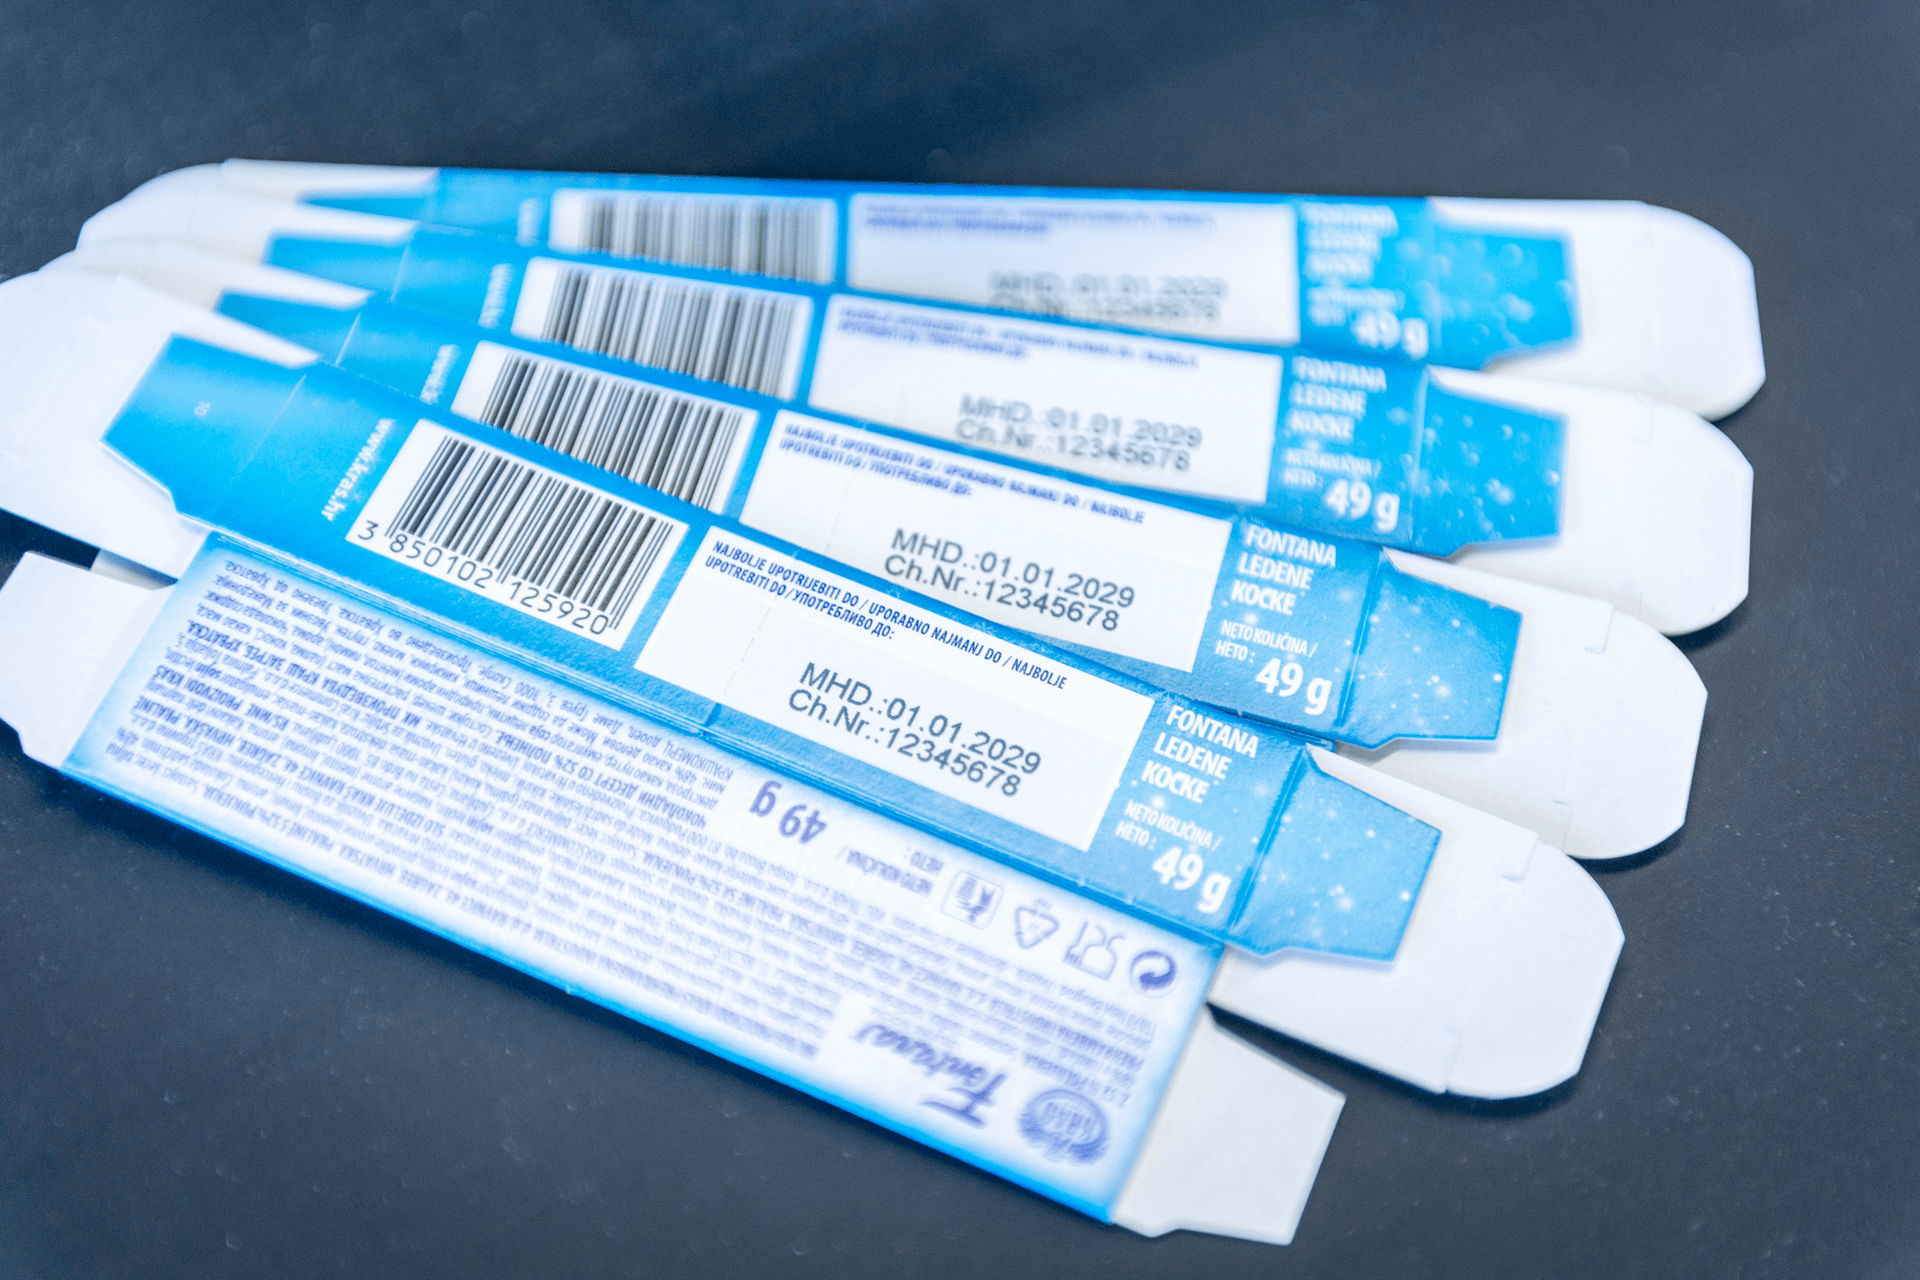 Cartons printed with betaJET thermal inkjet